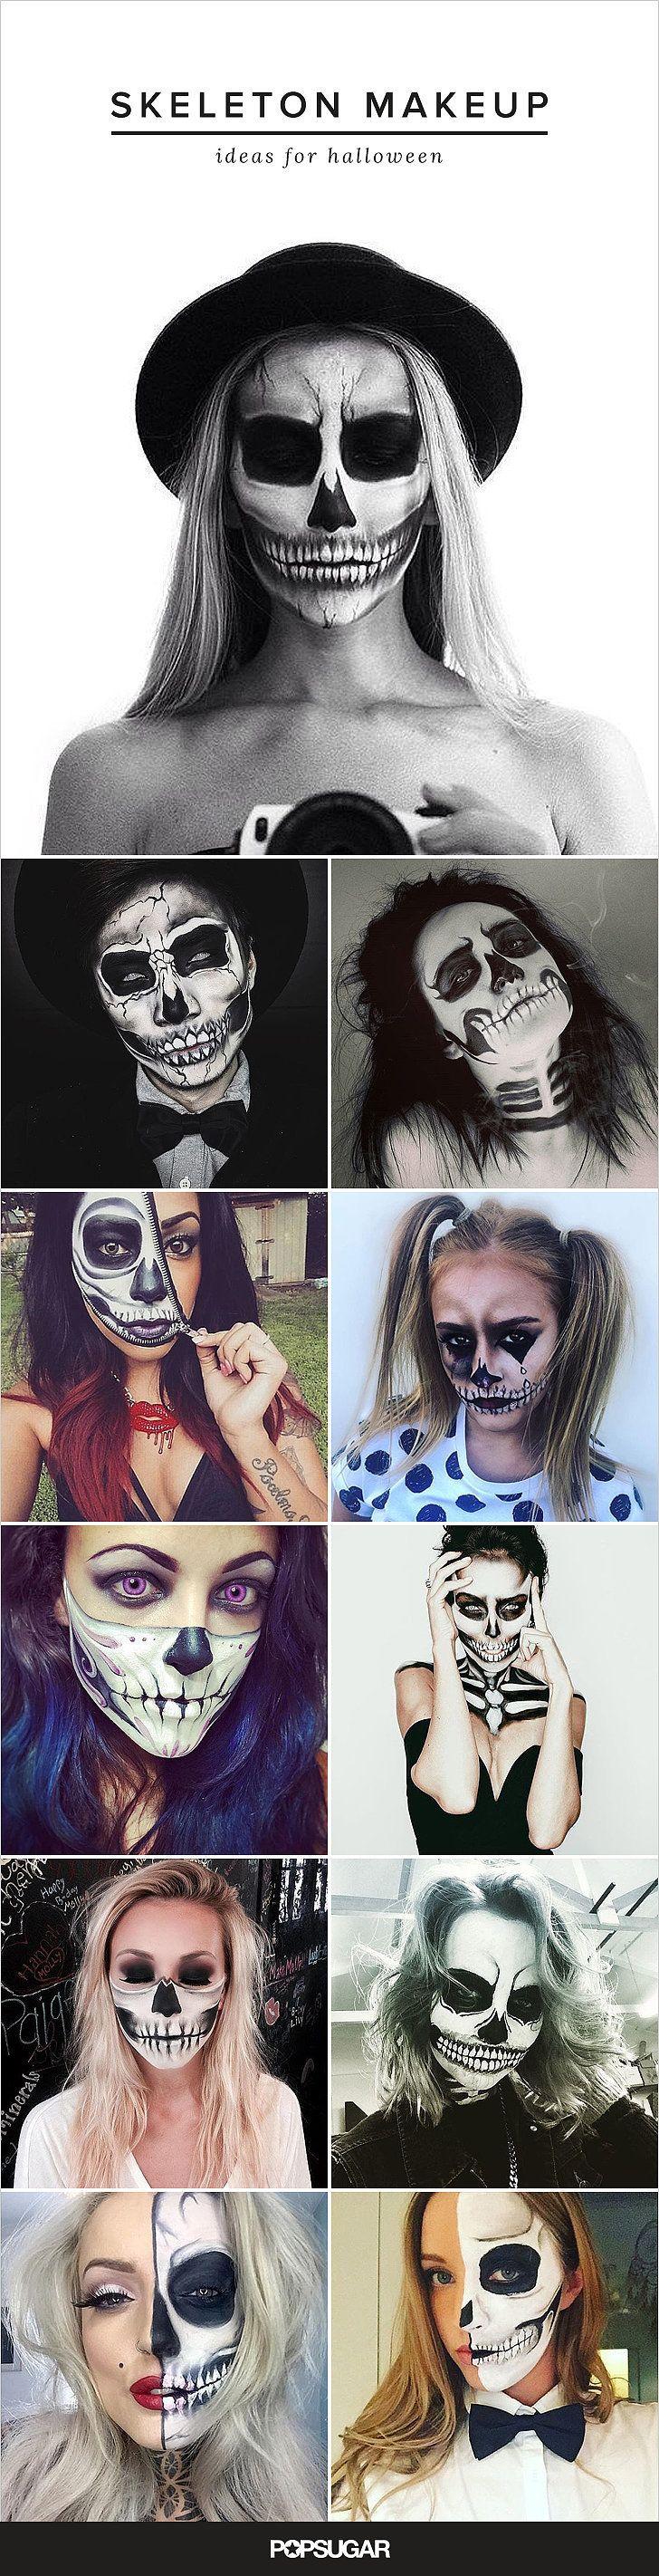 Skeleton makeup Halloween